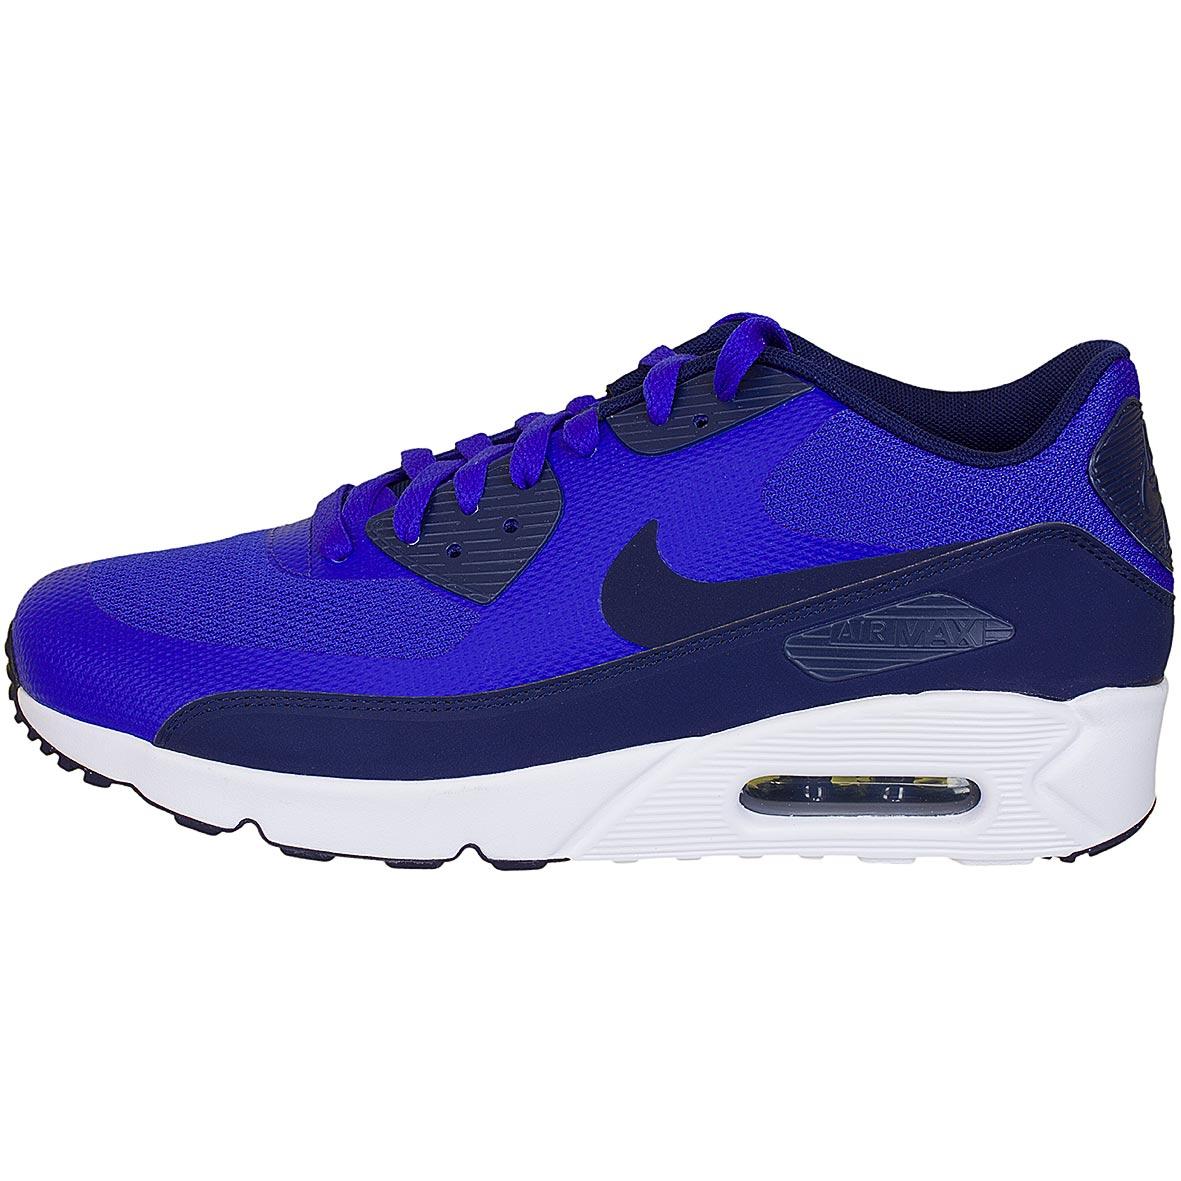 info for ca306 f9c23 Nike Sneaker Air Max 90 Ultra 2.0 Essential blauweiß